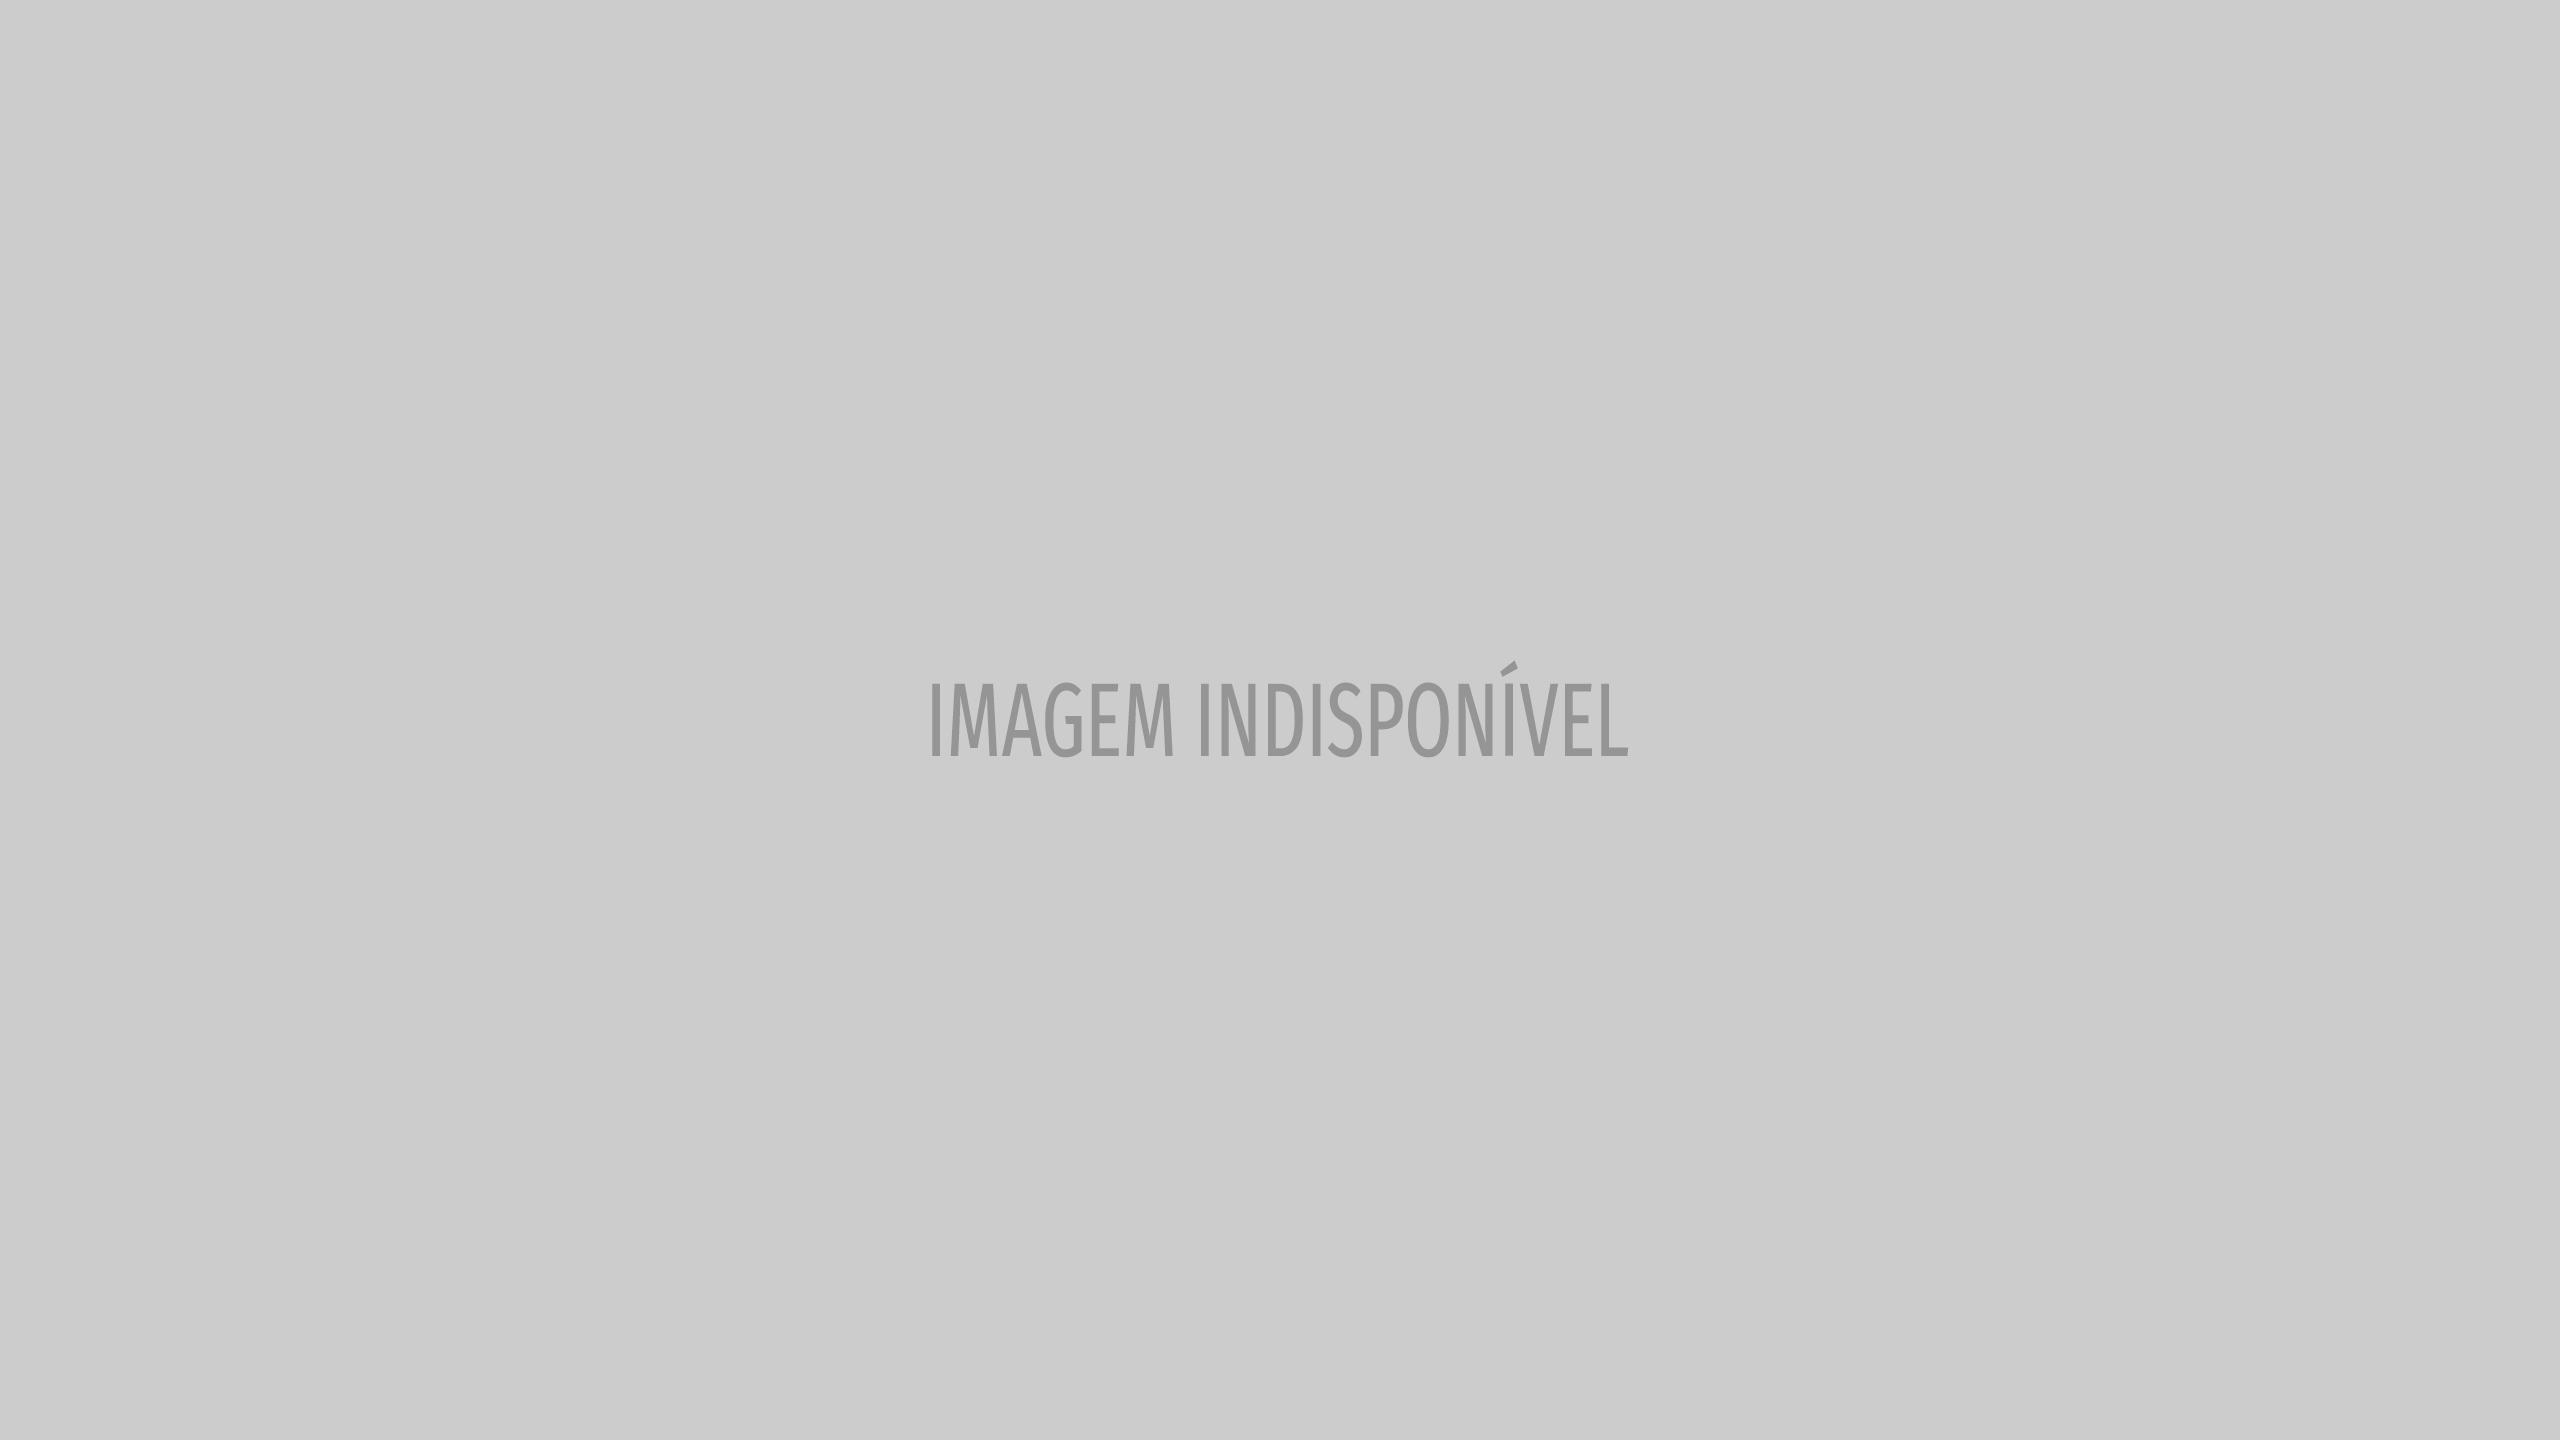 naom 57ebfff628d1d - Resposta de Solange Almeida para seguidora viraliza na web